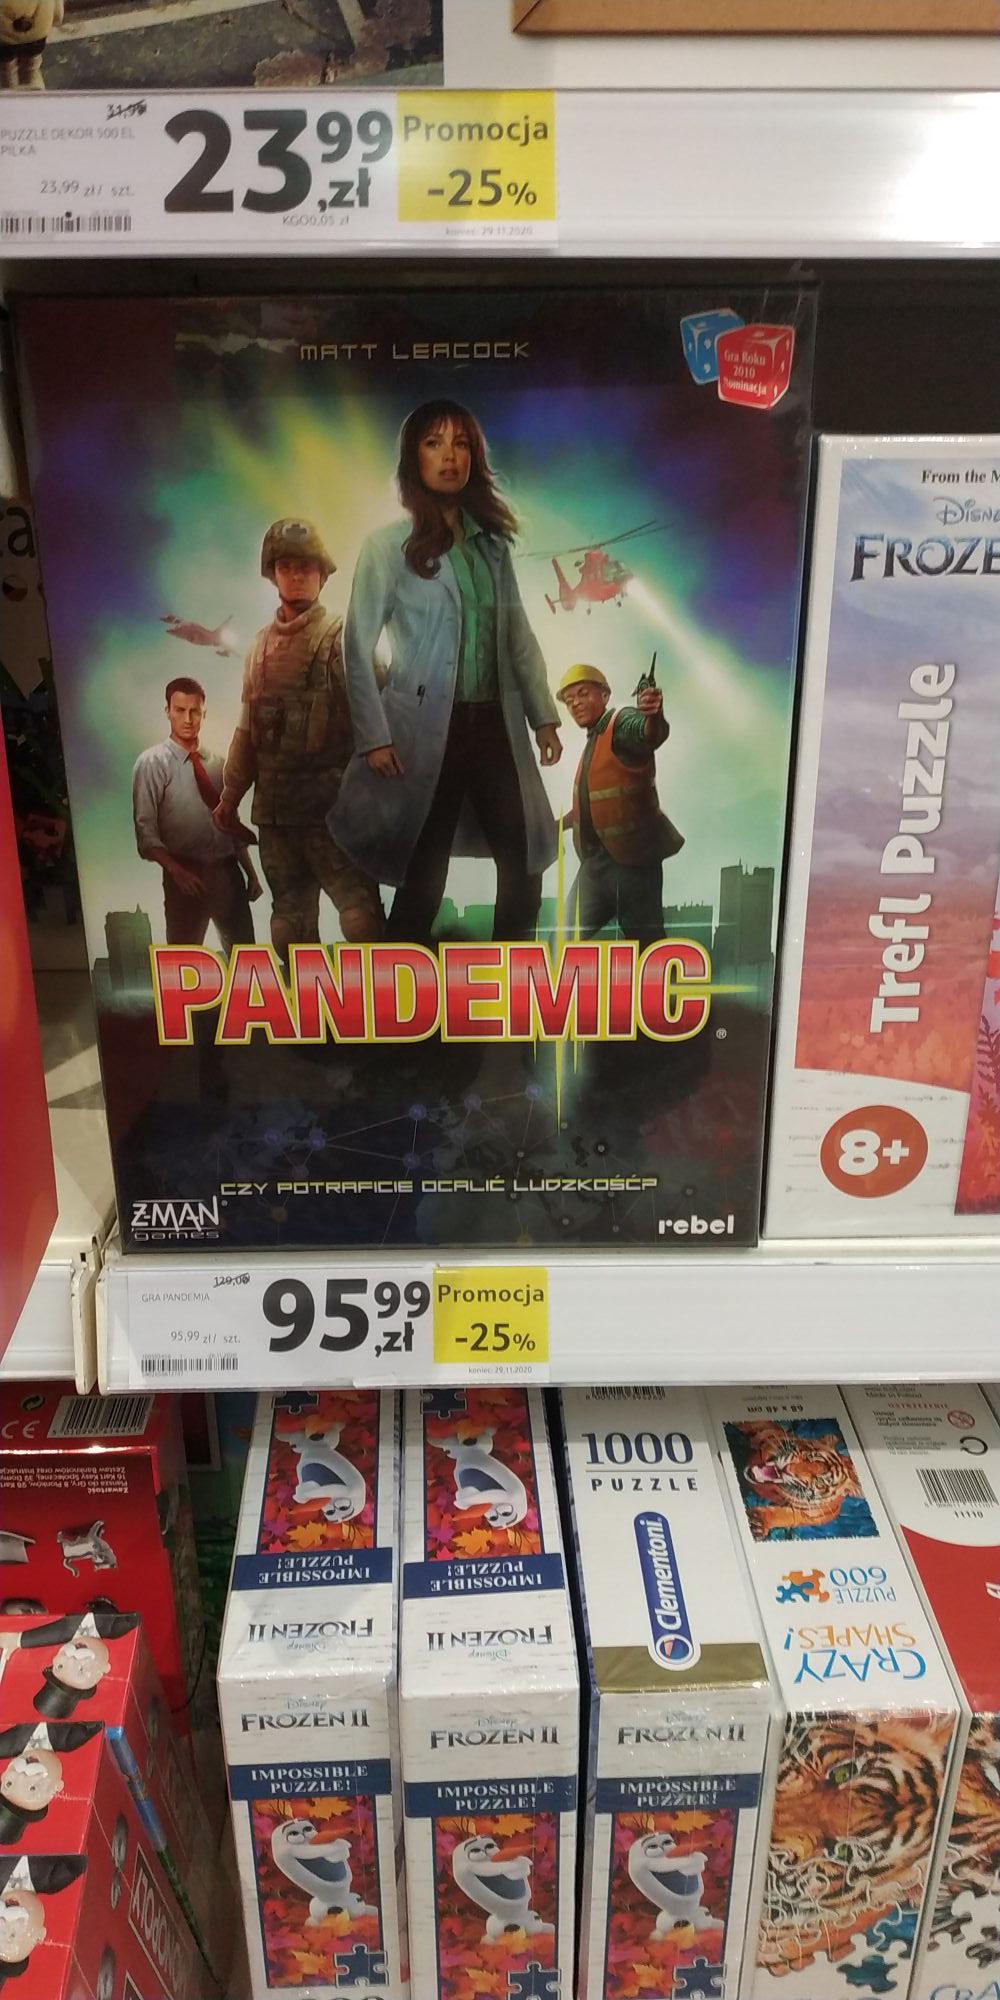 Pandemic - Tesco Gorczewska